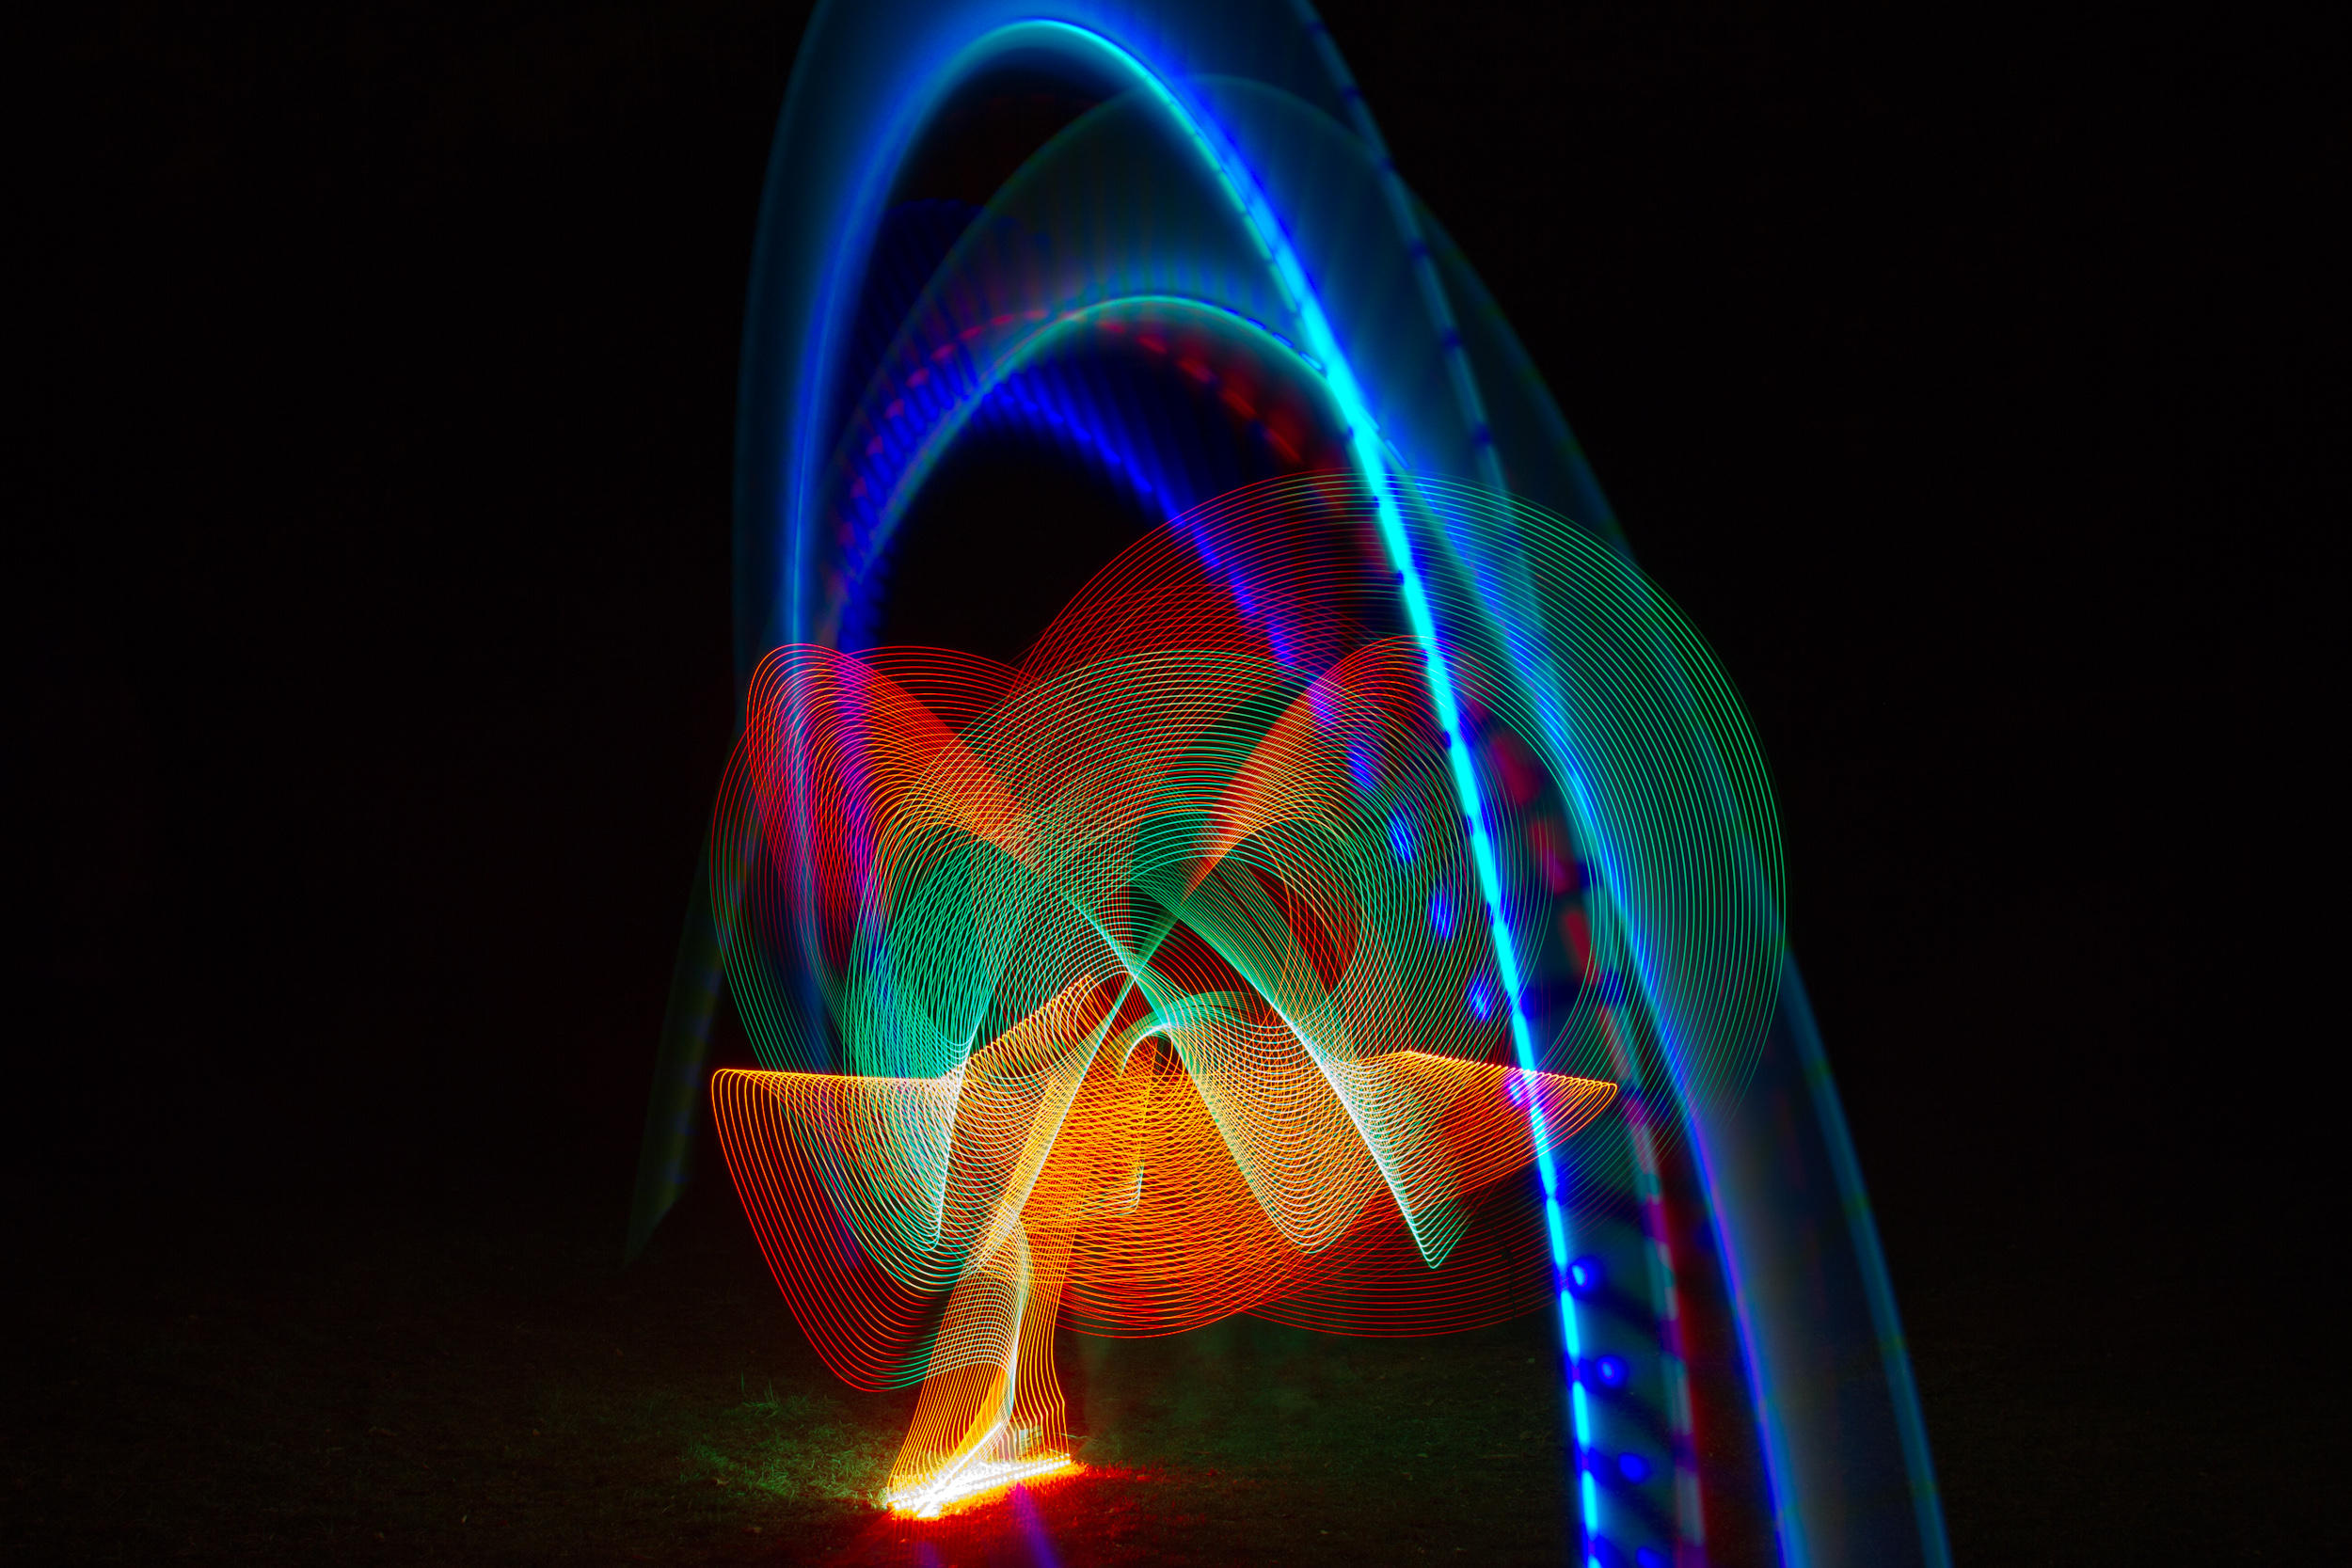 Circle by frenchbear